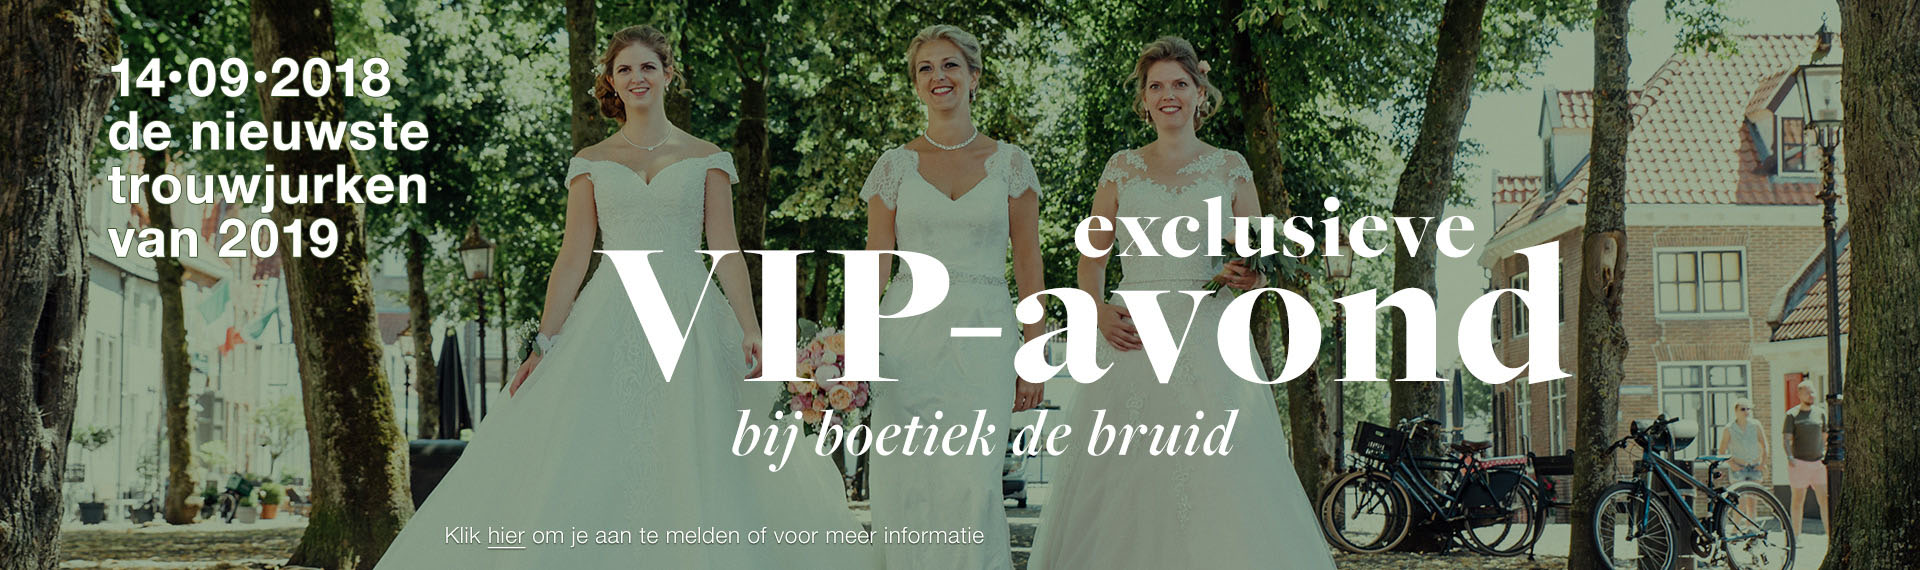 VIP-avond boetiek de bruid